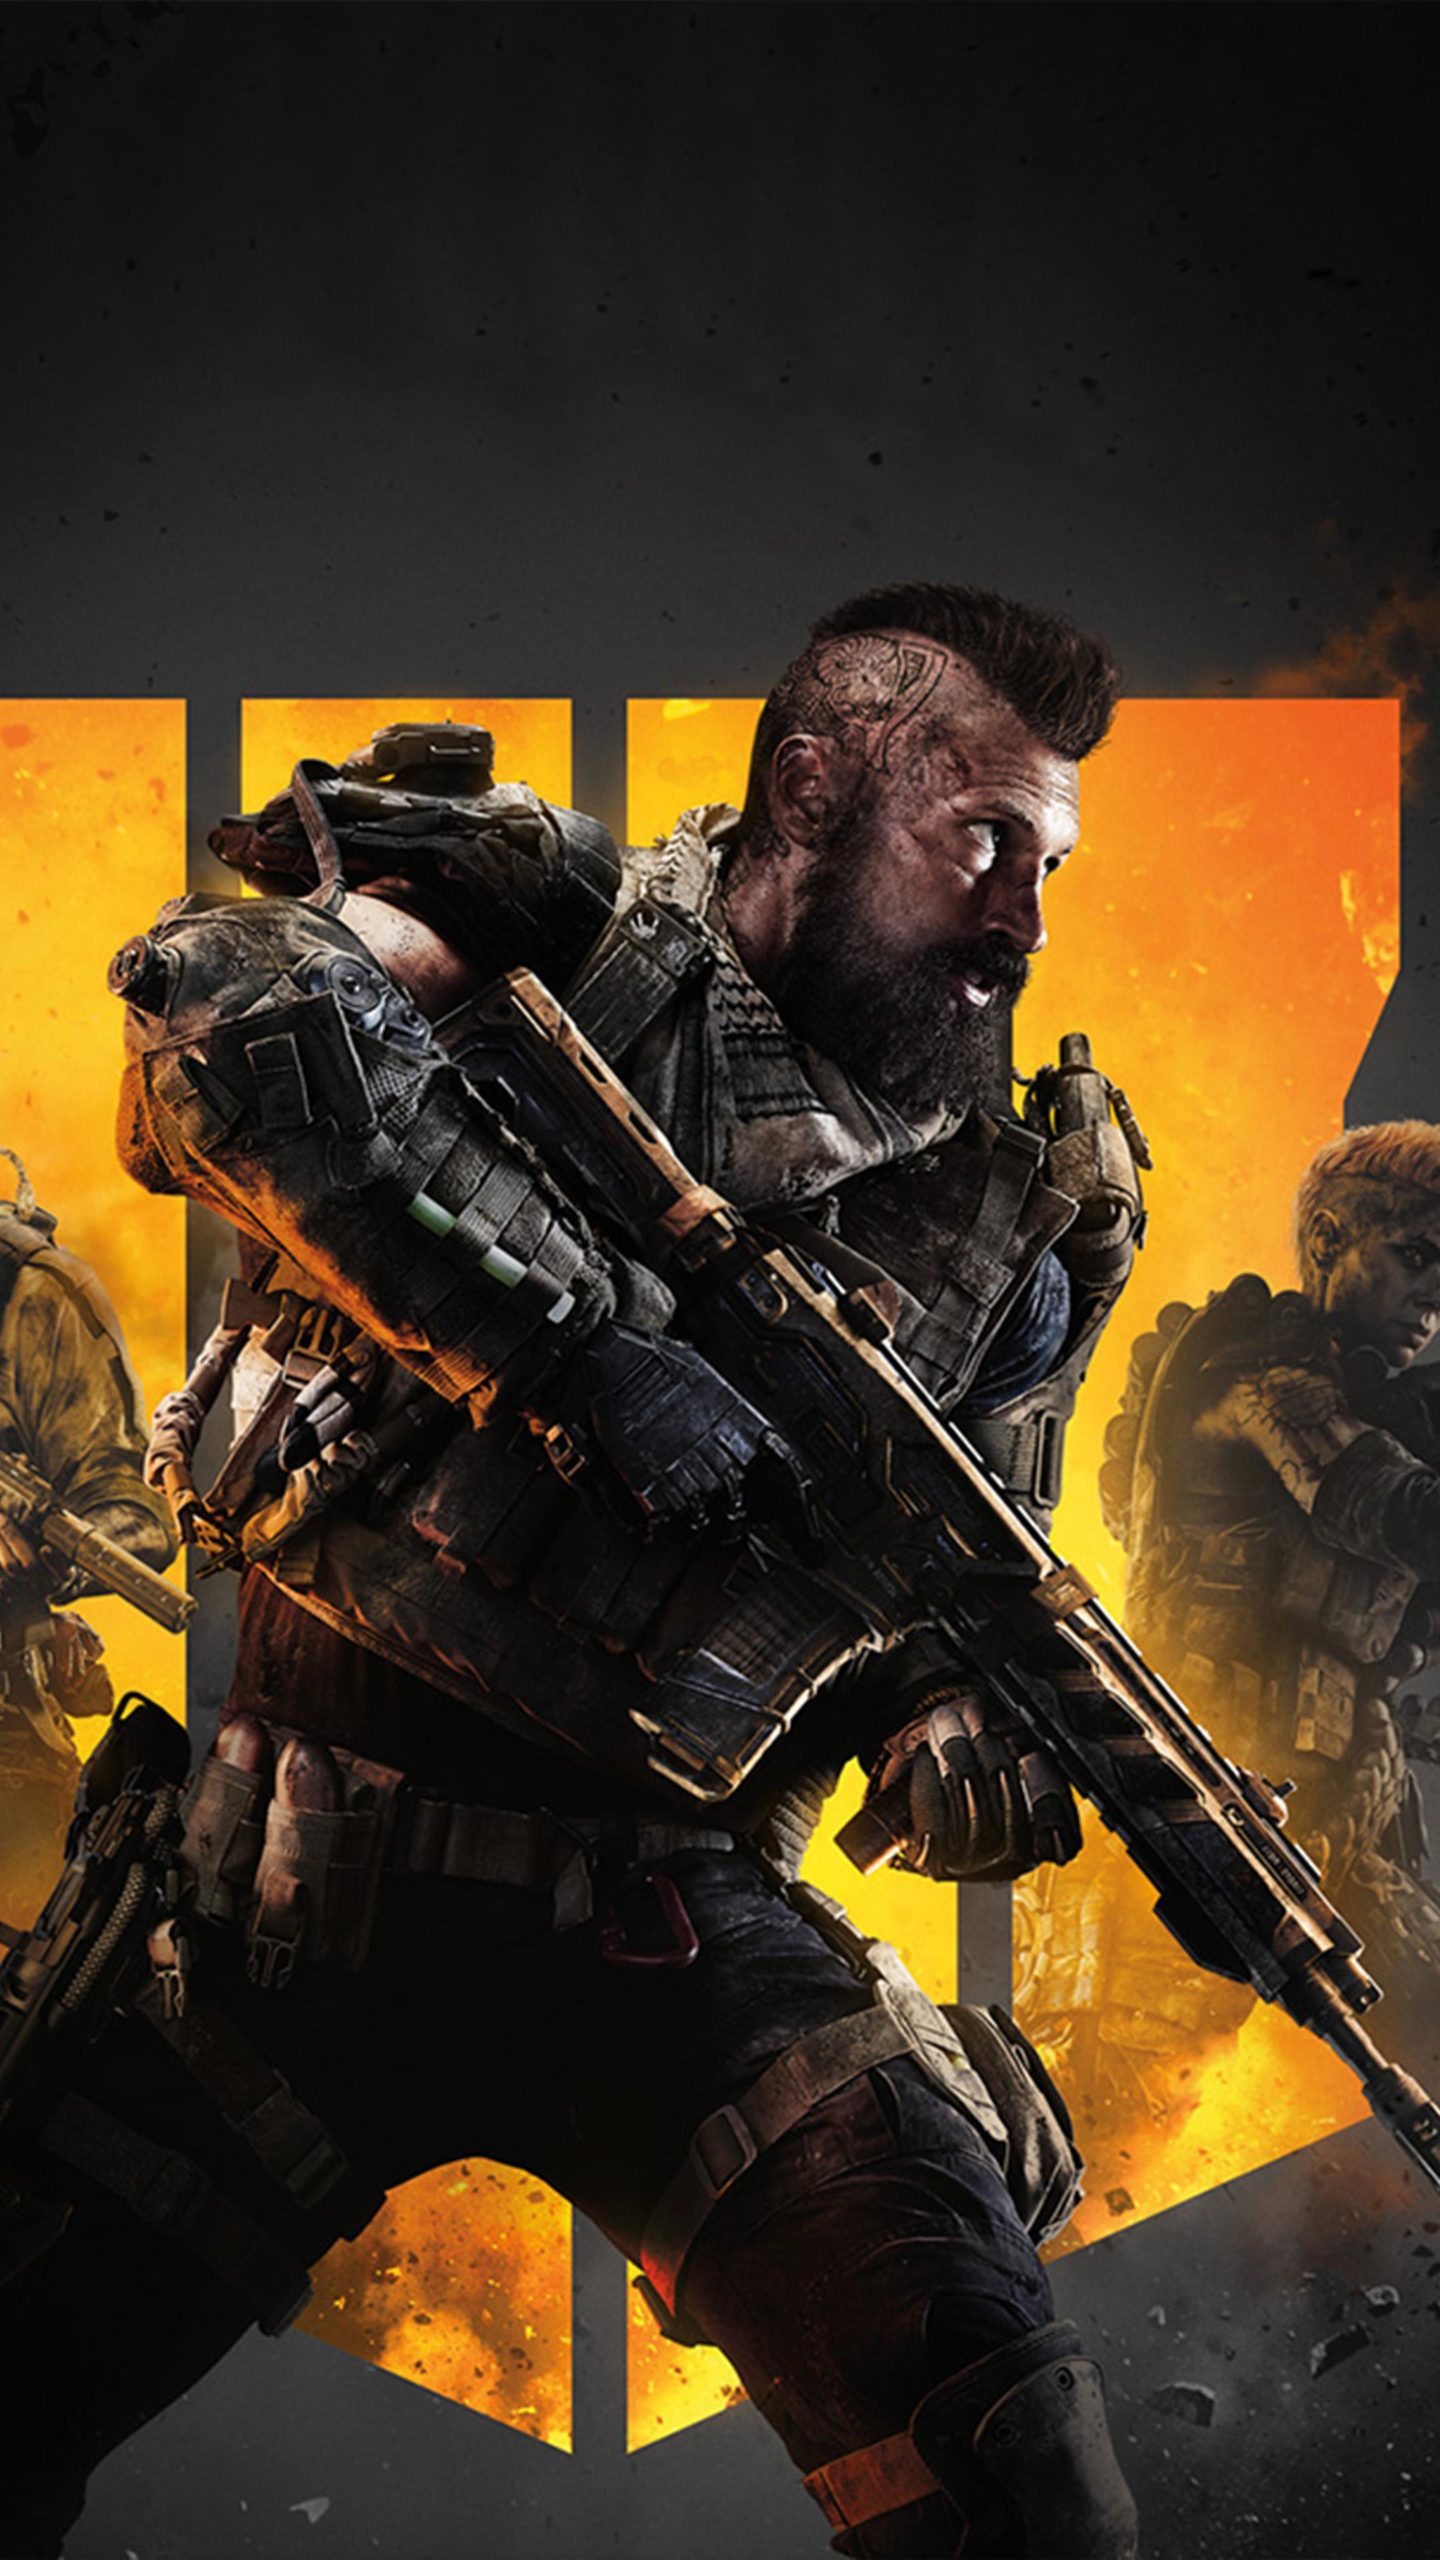 Call Of Duty Black Ops 4 4k Ultra Hd Mobile Wallpaper